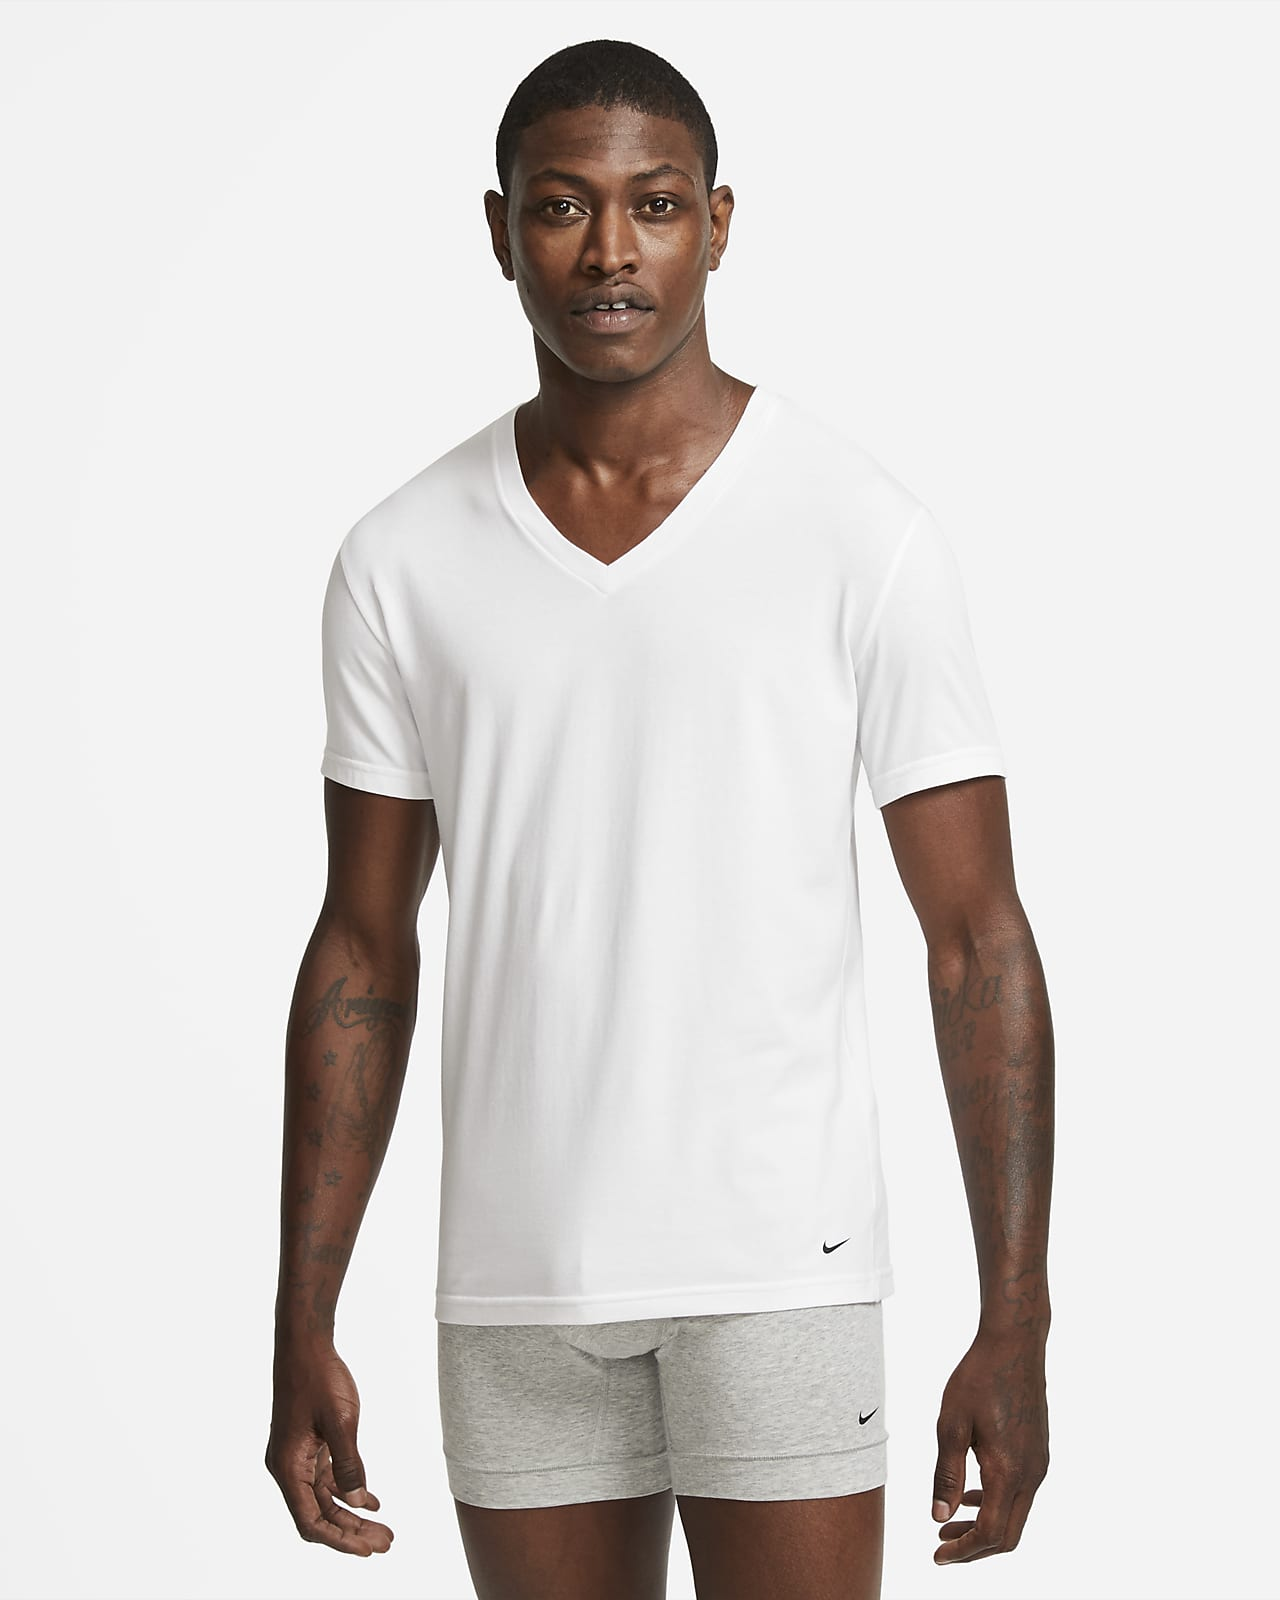 Nike Everyday Cotton Stretch Men's Slim Fit V-Neck Undershirt (2-Pack)